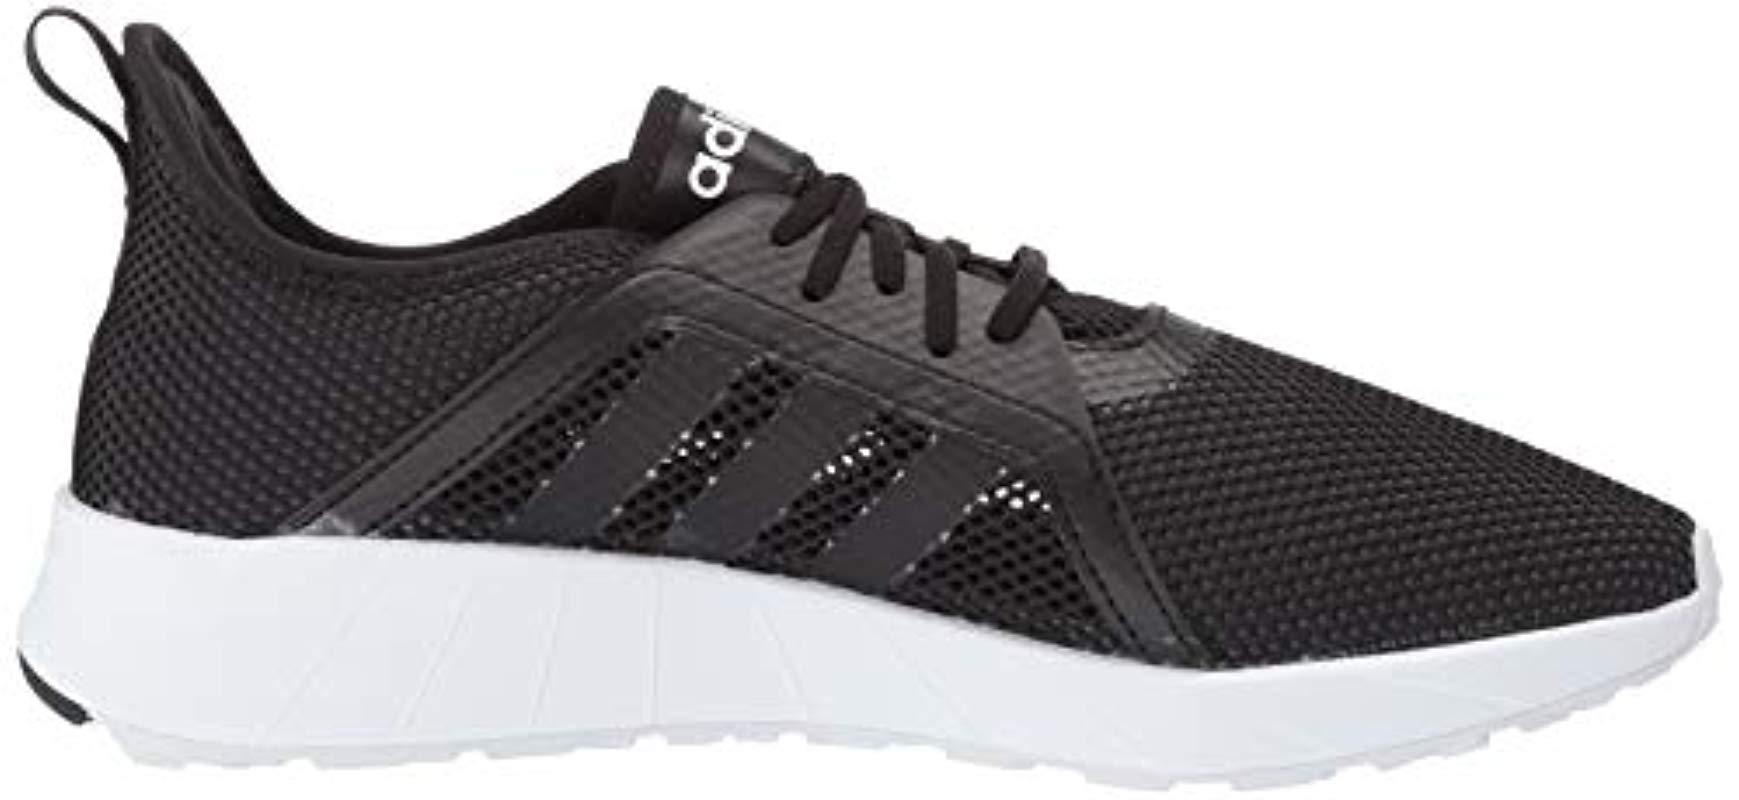 adidas Lace Questar Sumr in Black/Black